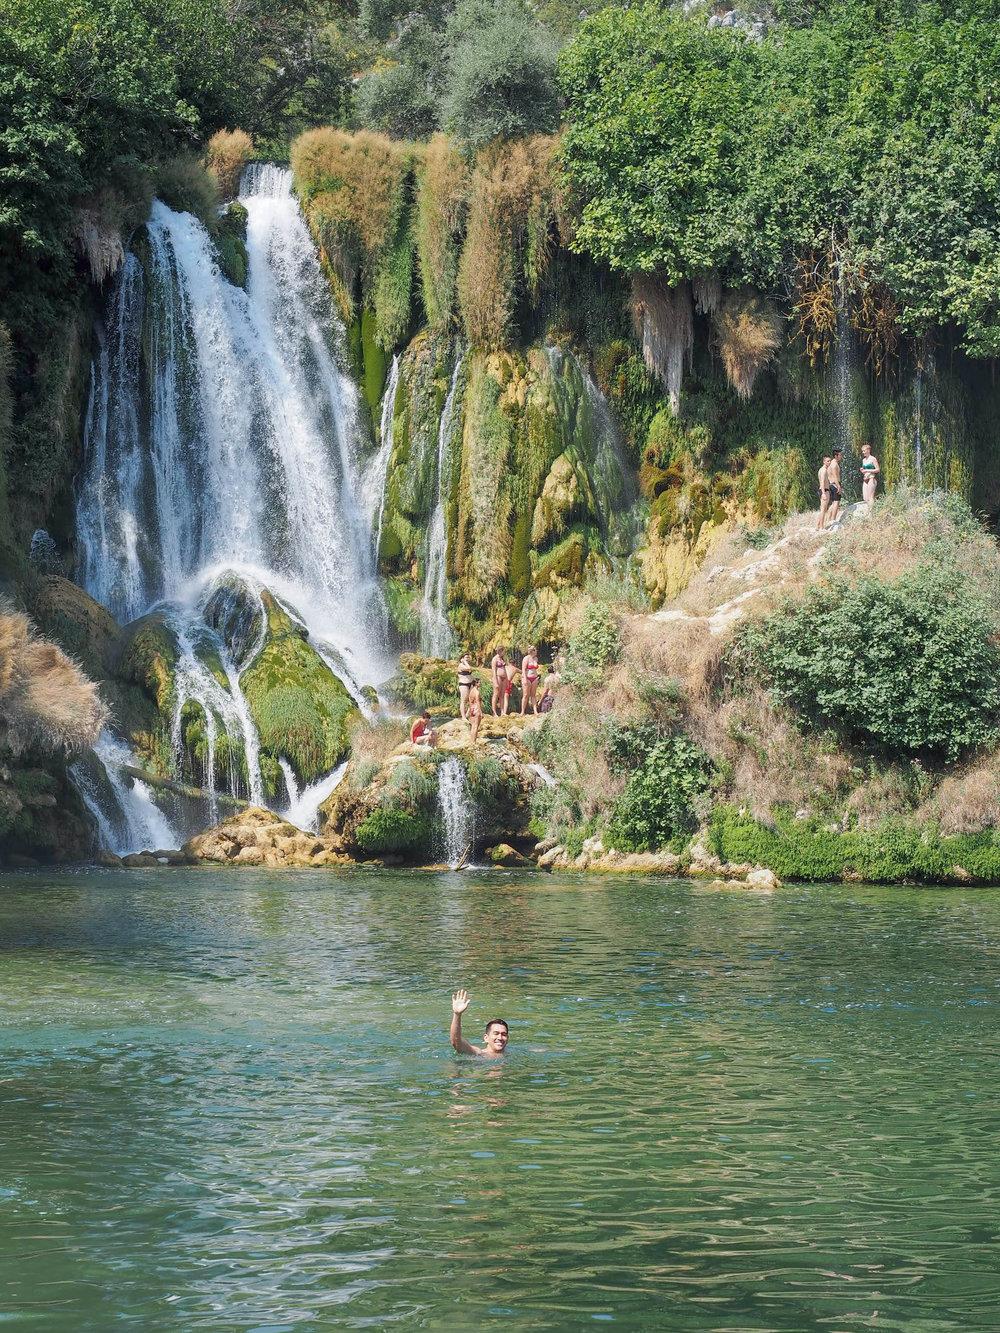 kravice-waterfall-bosnia-herzegovina-13